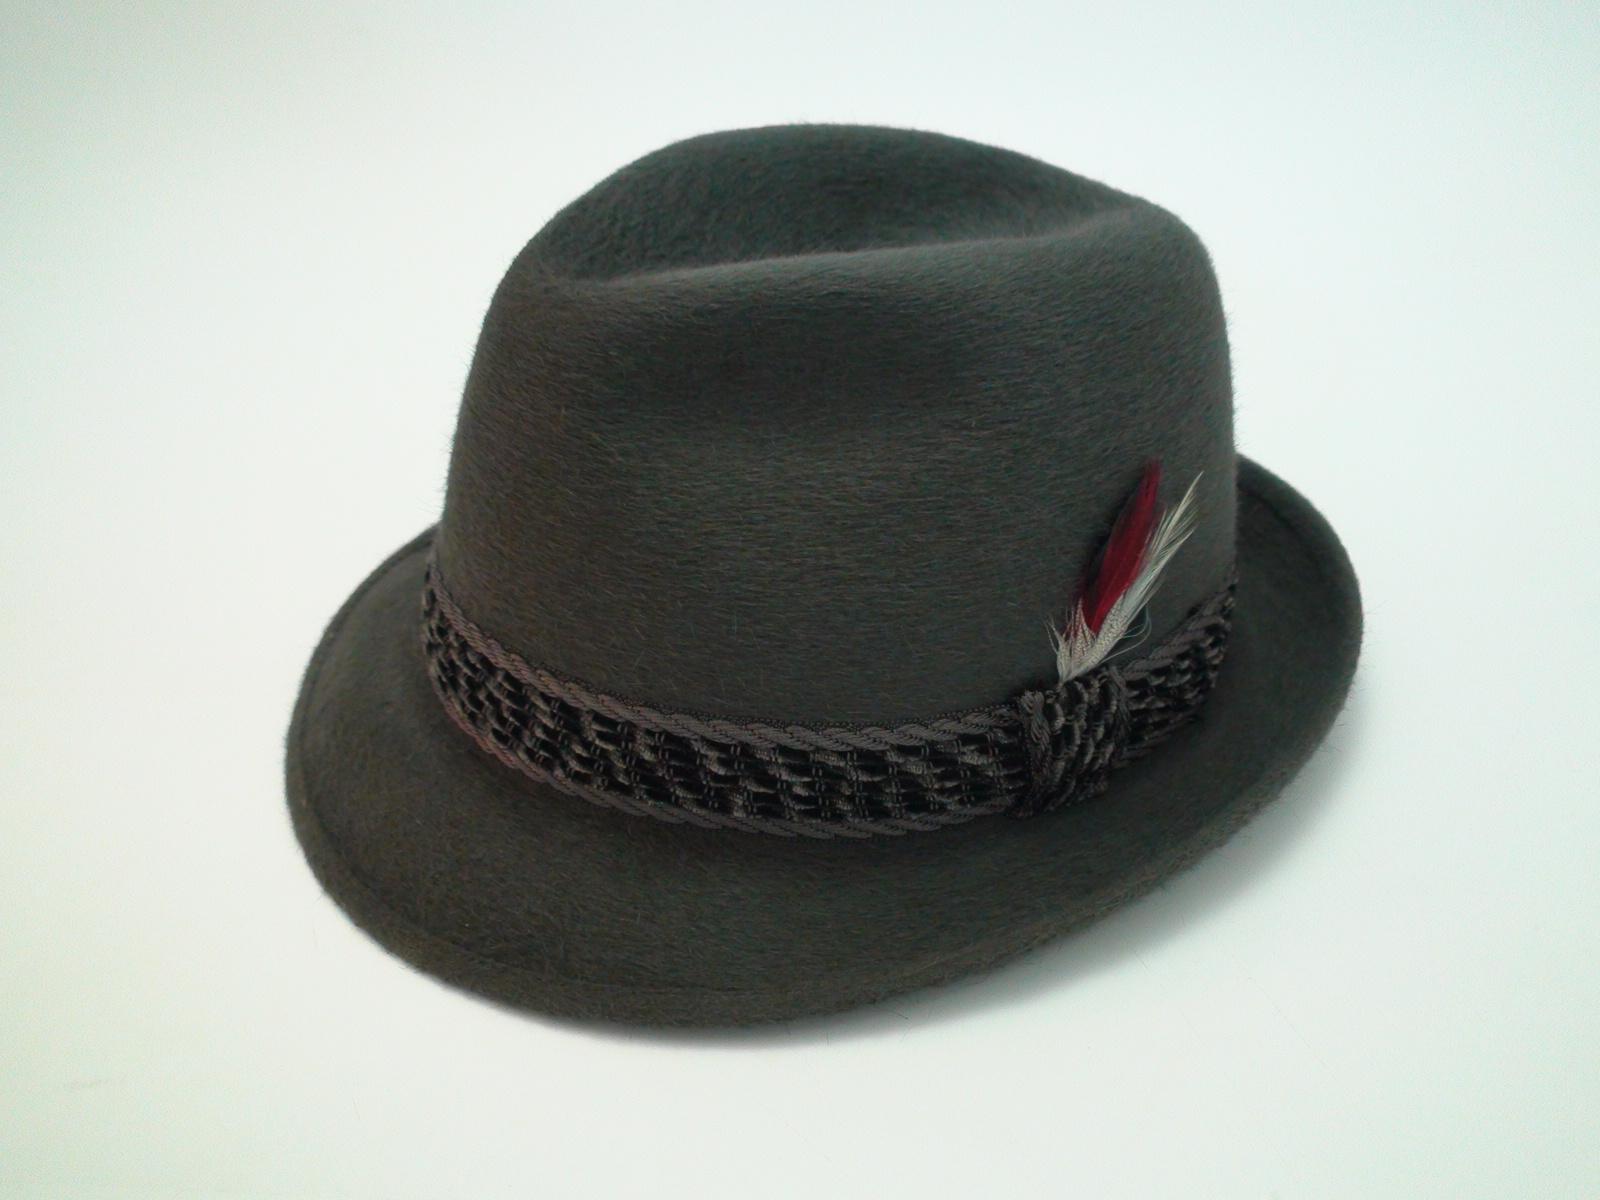 Vintage Dobbs Fifth Avenue New York Charcoal Fur Felt Fedora Trilby Hat  Size 7 1 4″ 4c41ed6a56e